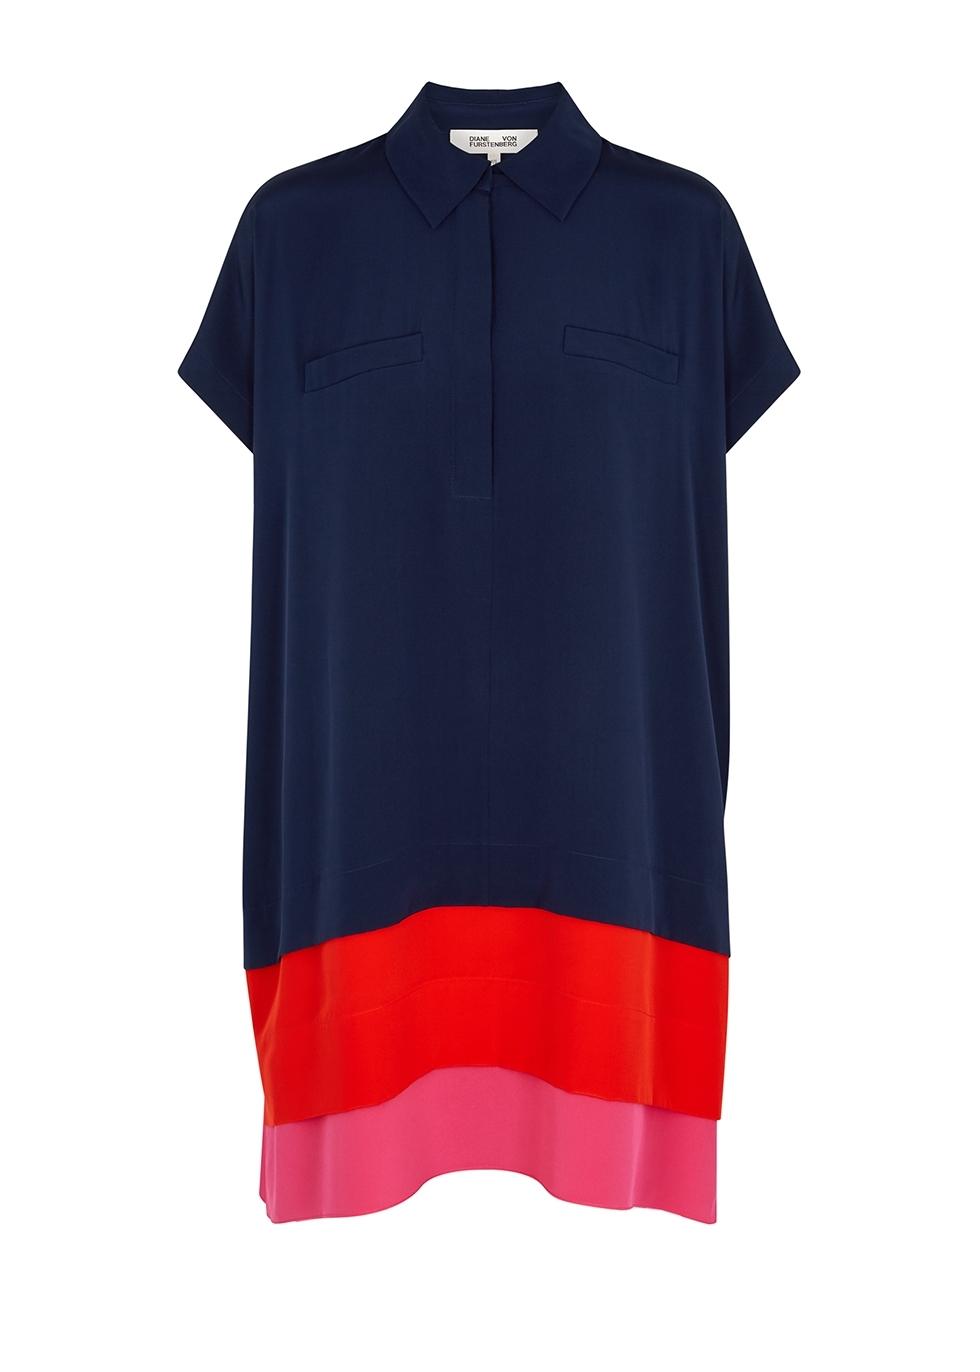 1854e735 Diane von Furstenberg Dresses, Shirts, Tops, Jackets - Harvey Nichols